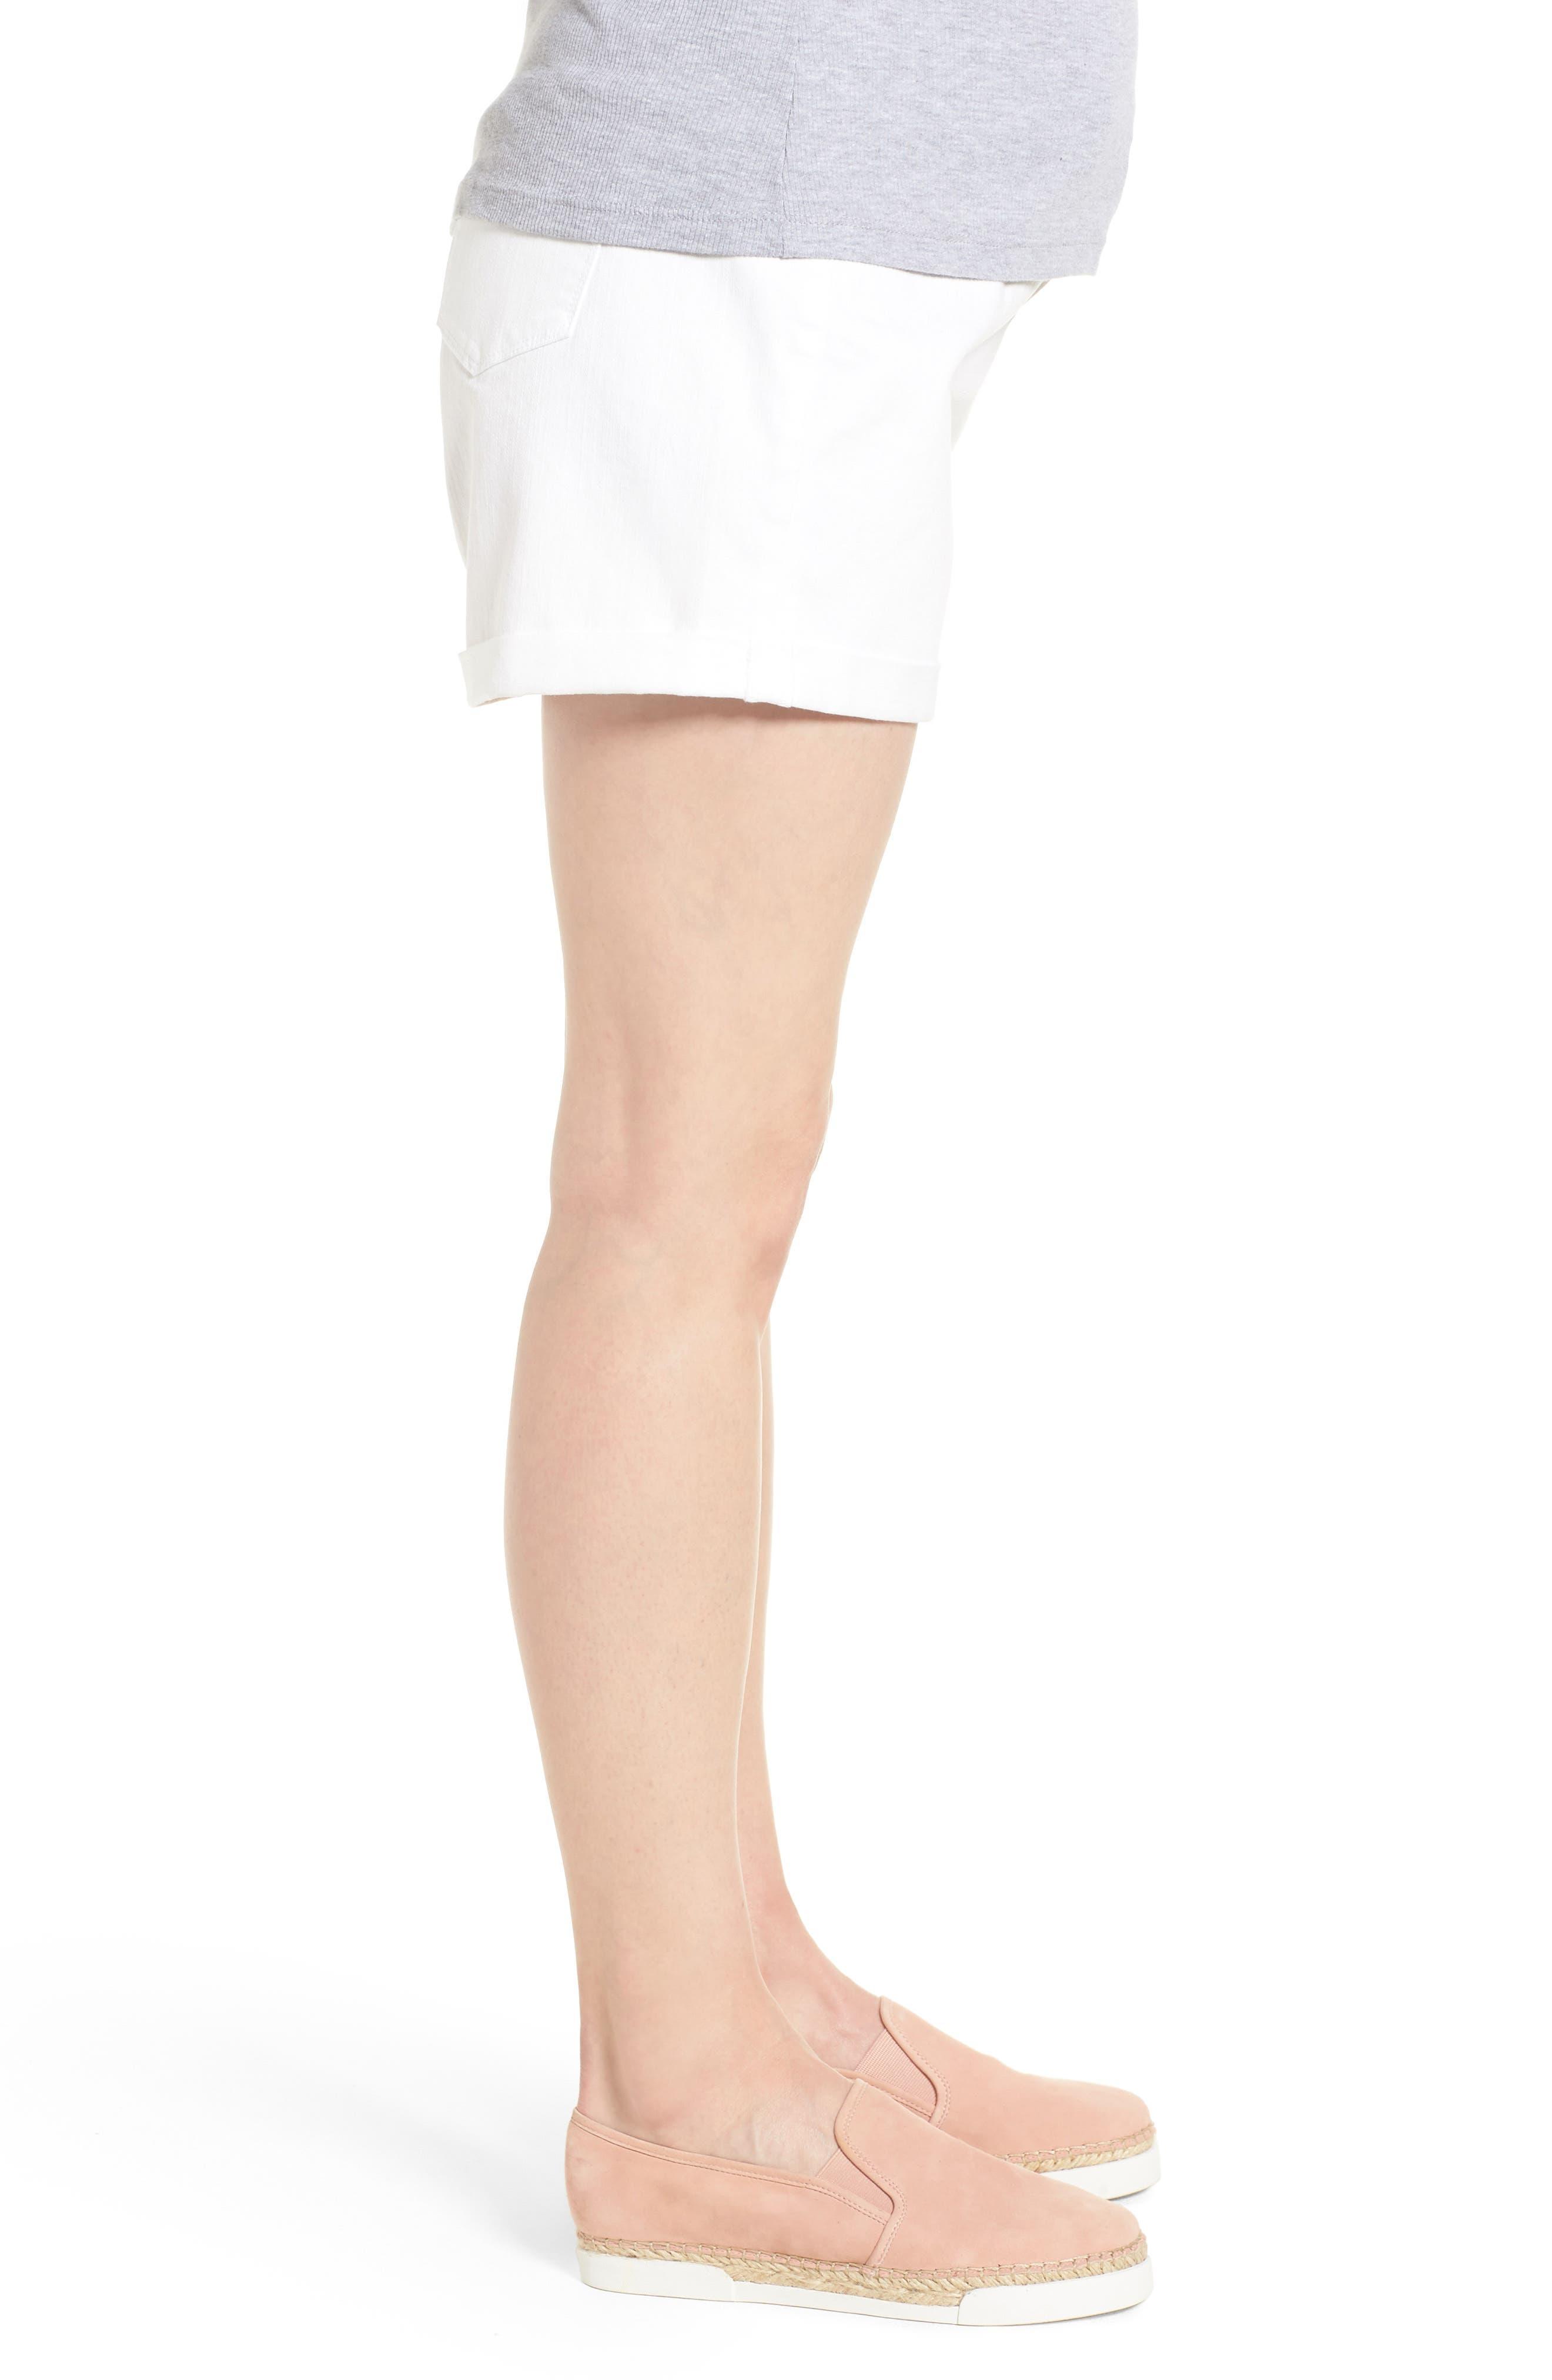 Mia Maternity Boyfriend Shorts,                             Alternate thumbnail 3, color,                             White